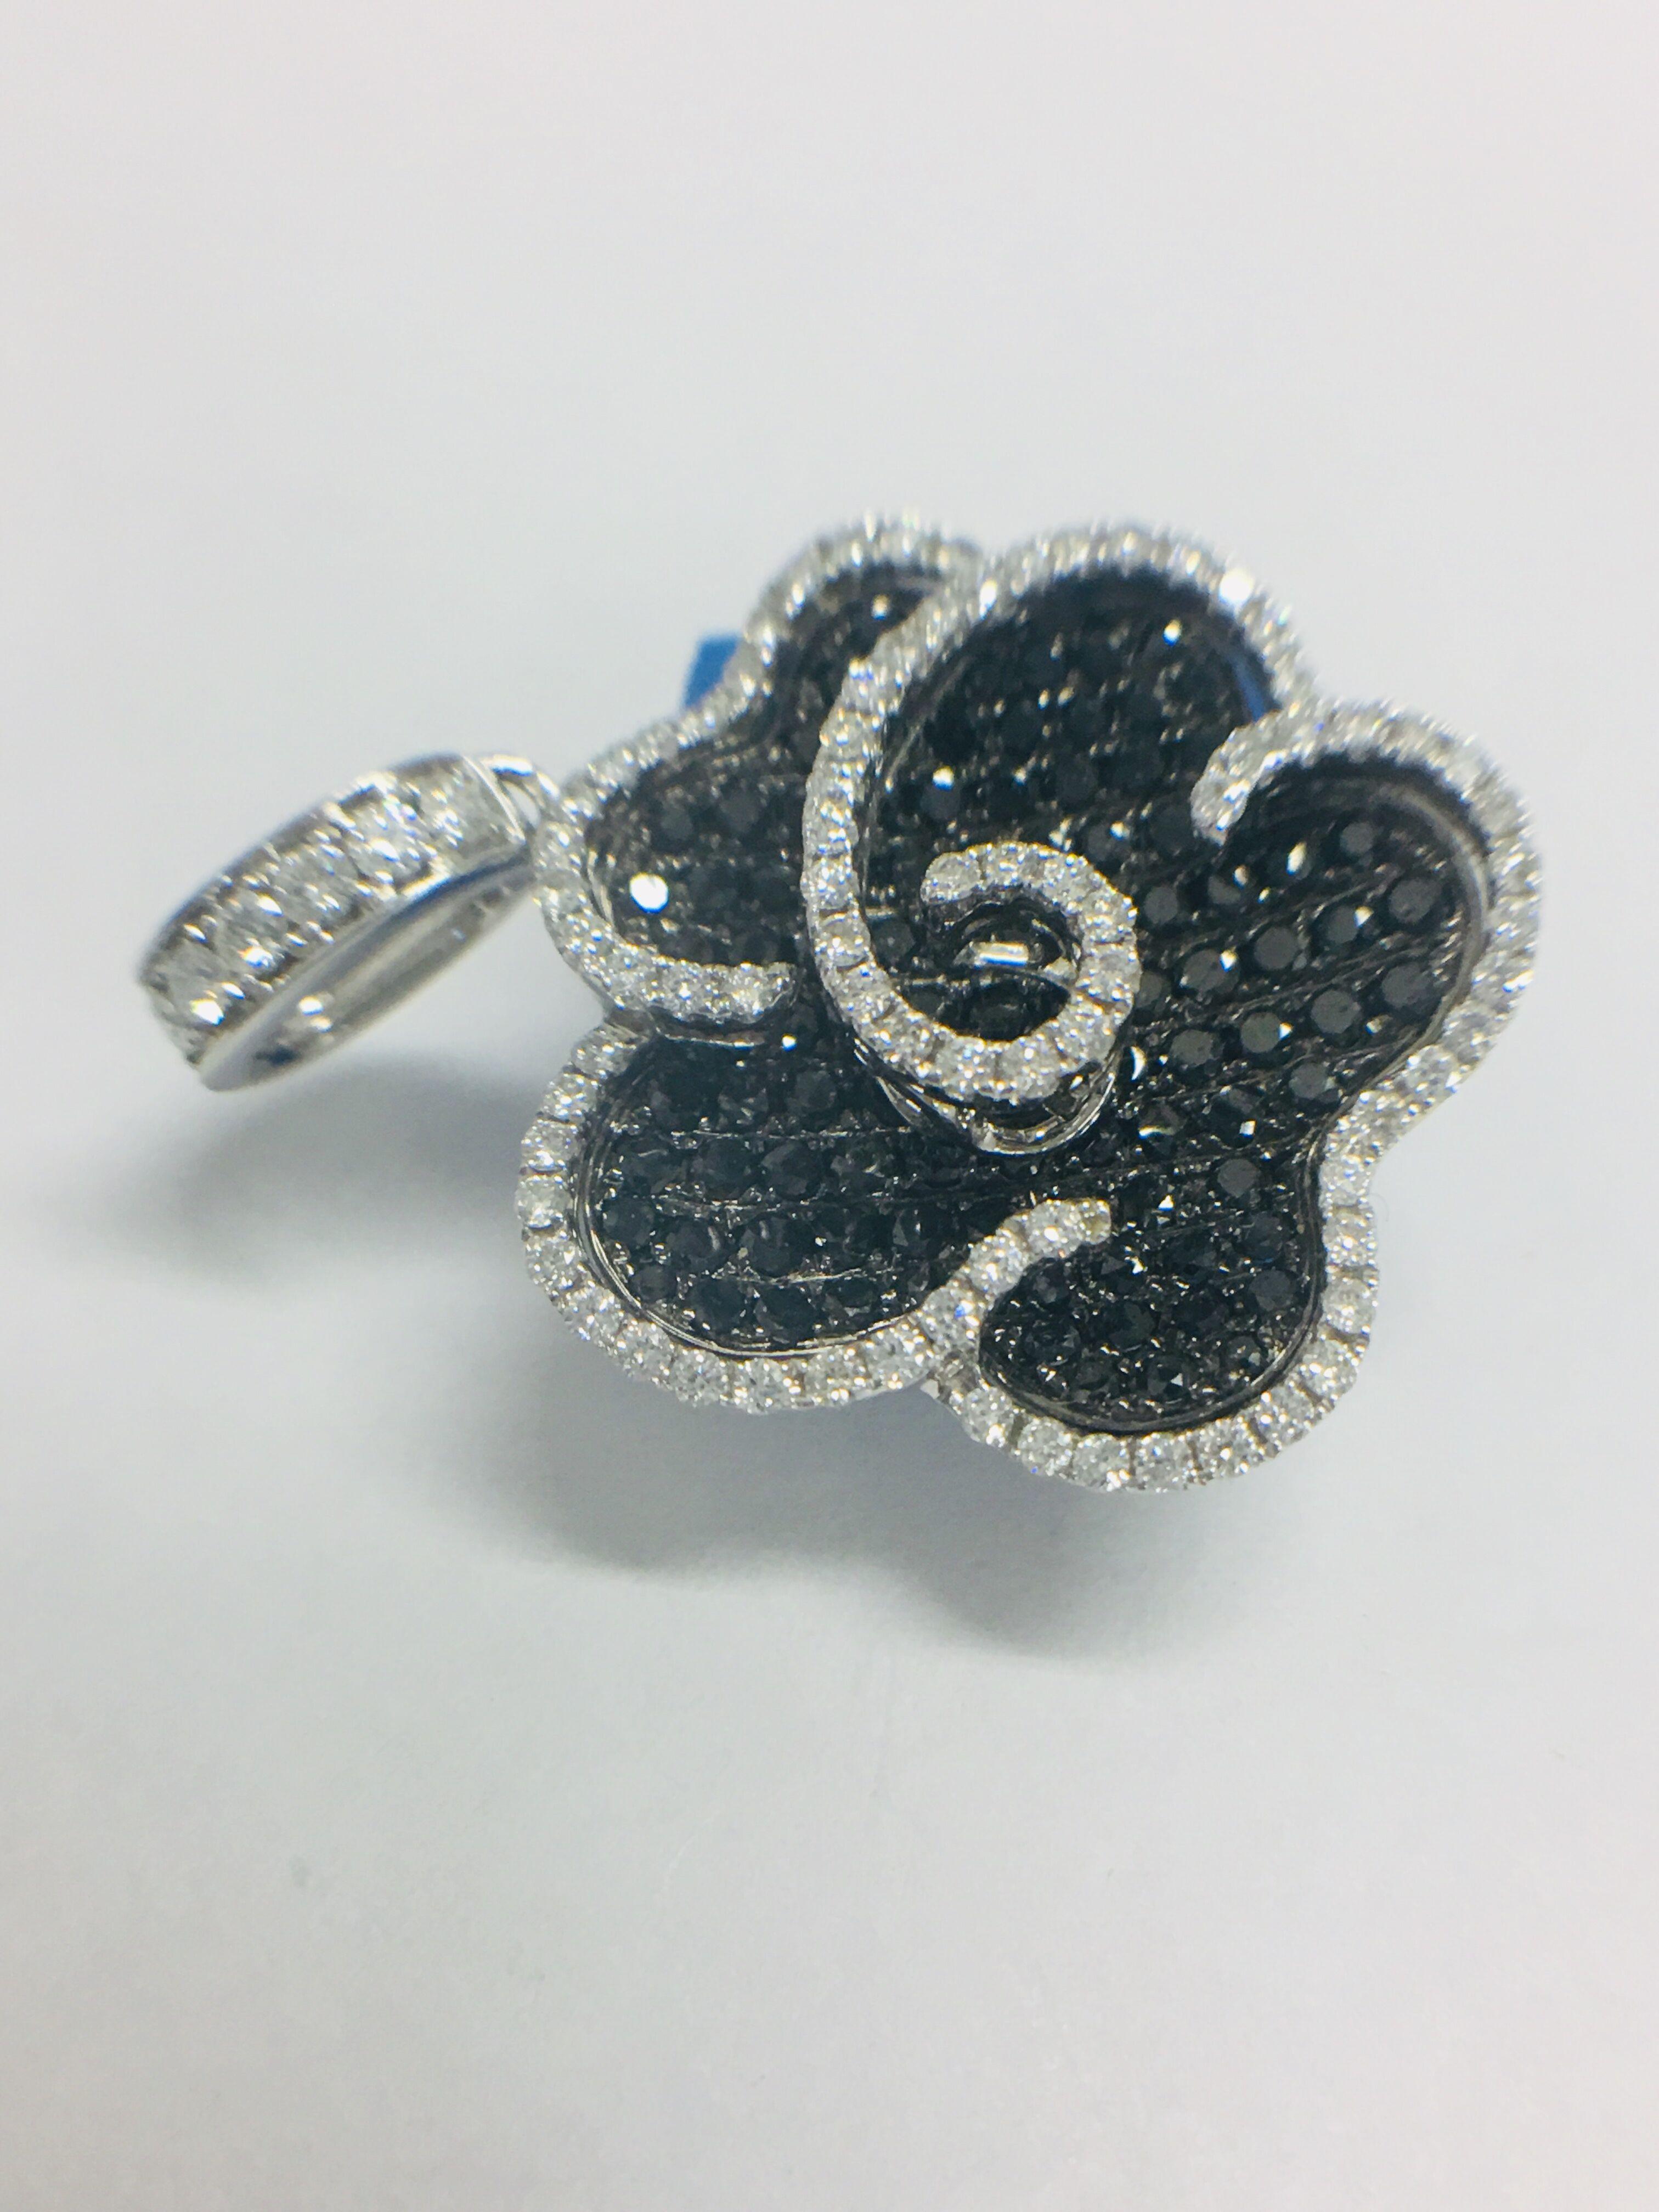 18ct white gold diamond pendant - Image 3 of 6